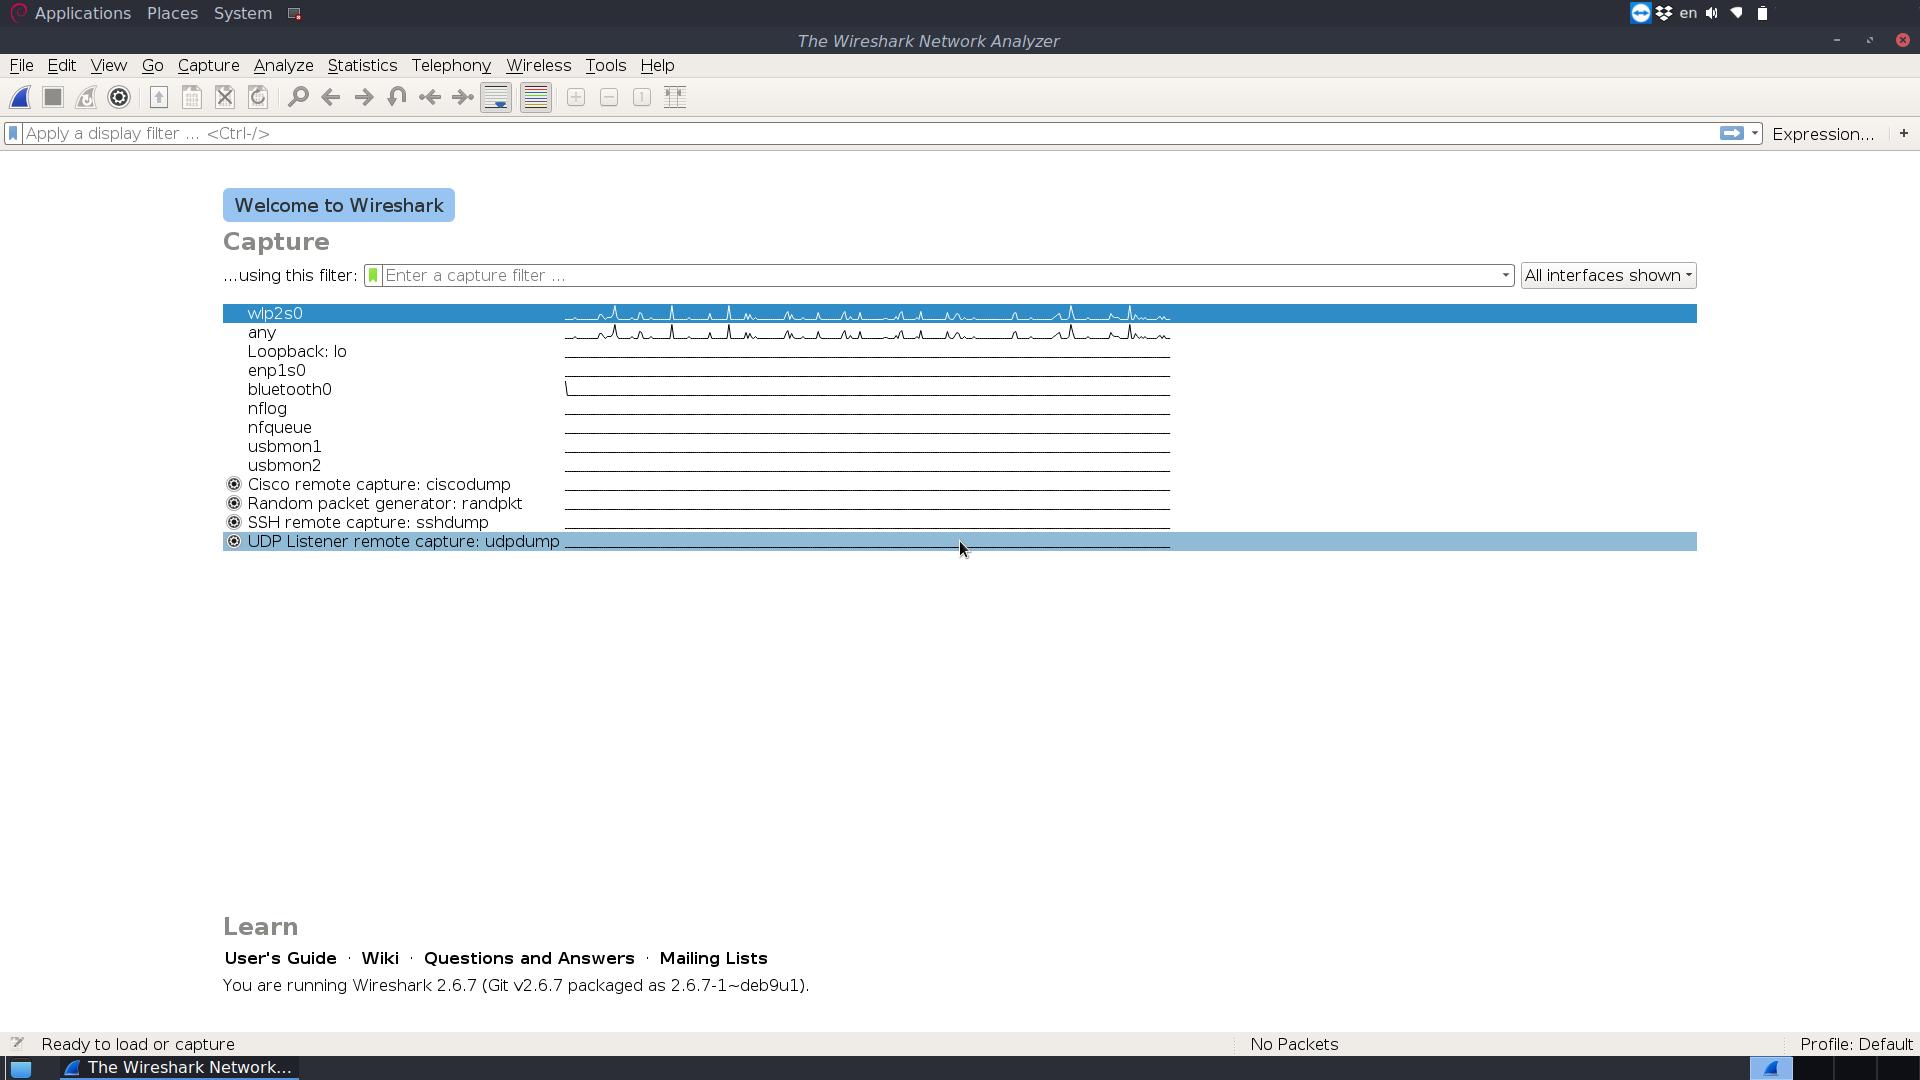 How to install WireShark on Debian/Ubuntu distros?